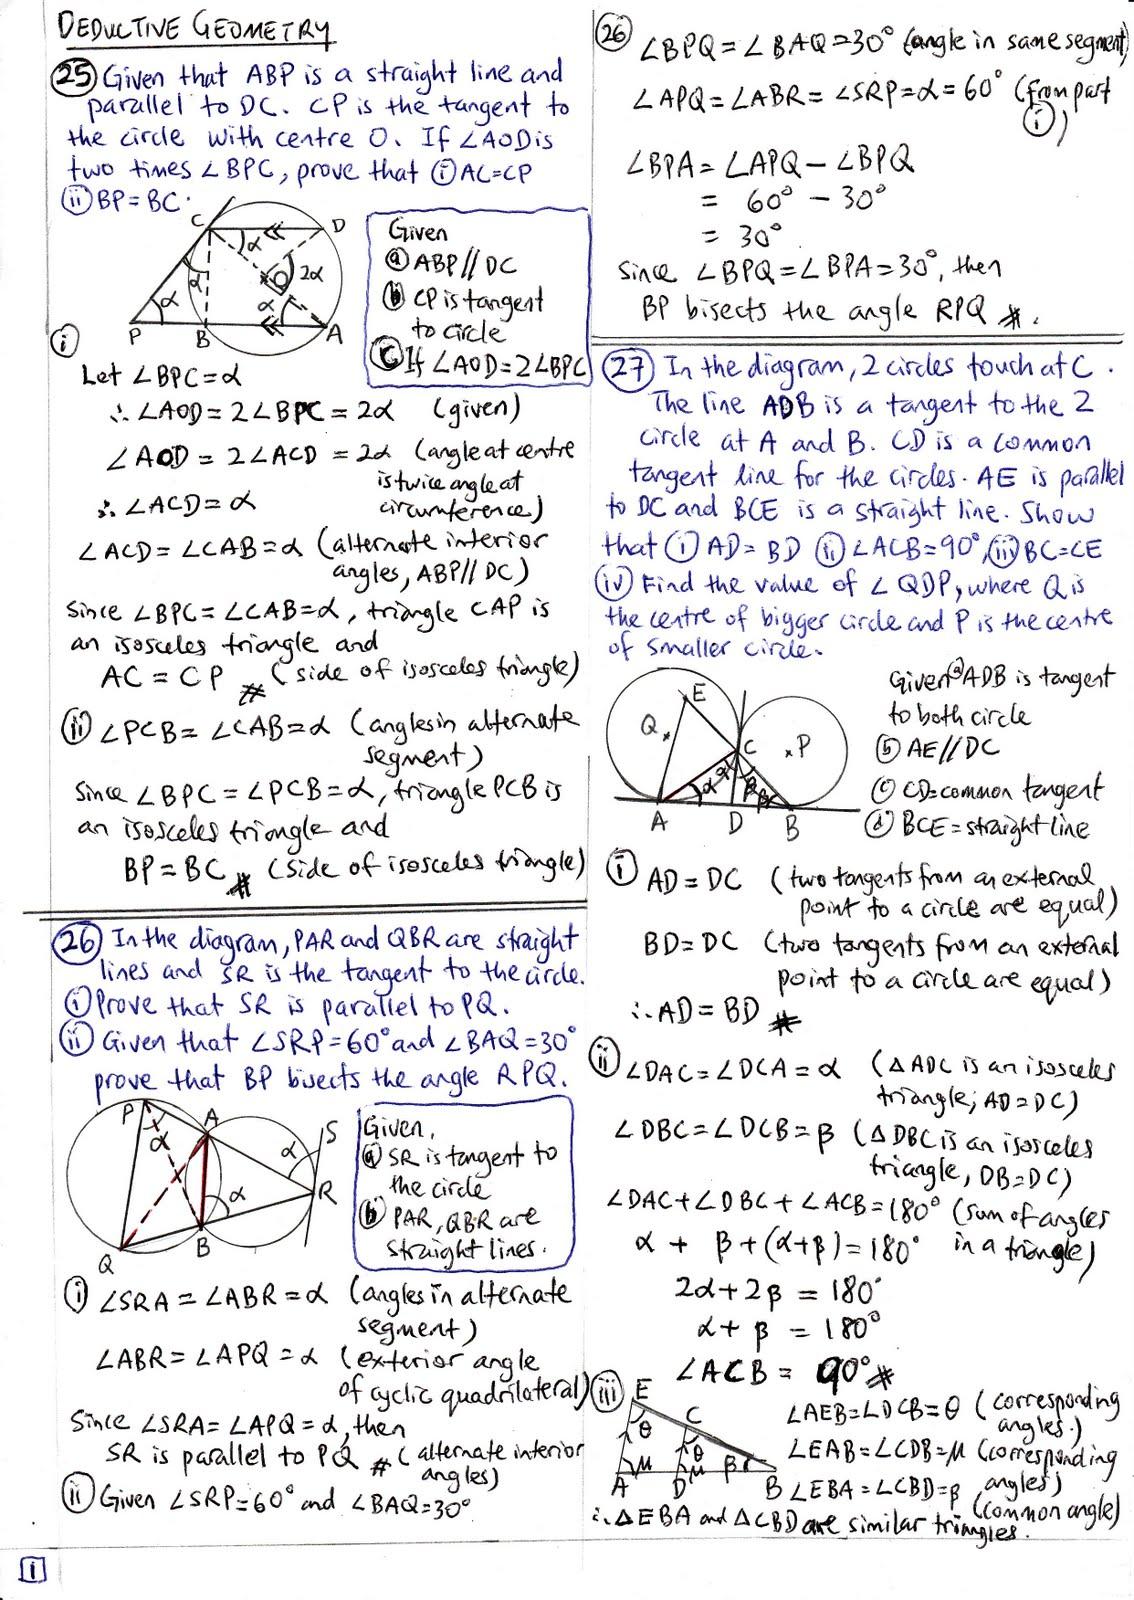 Geometry homework help and answers